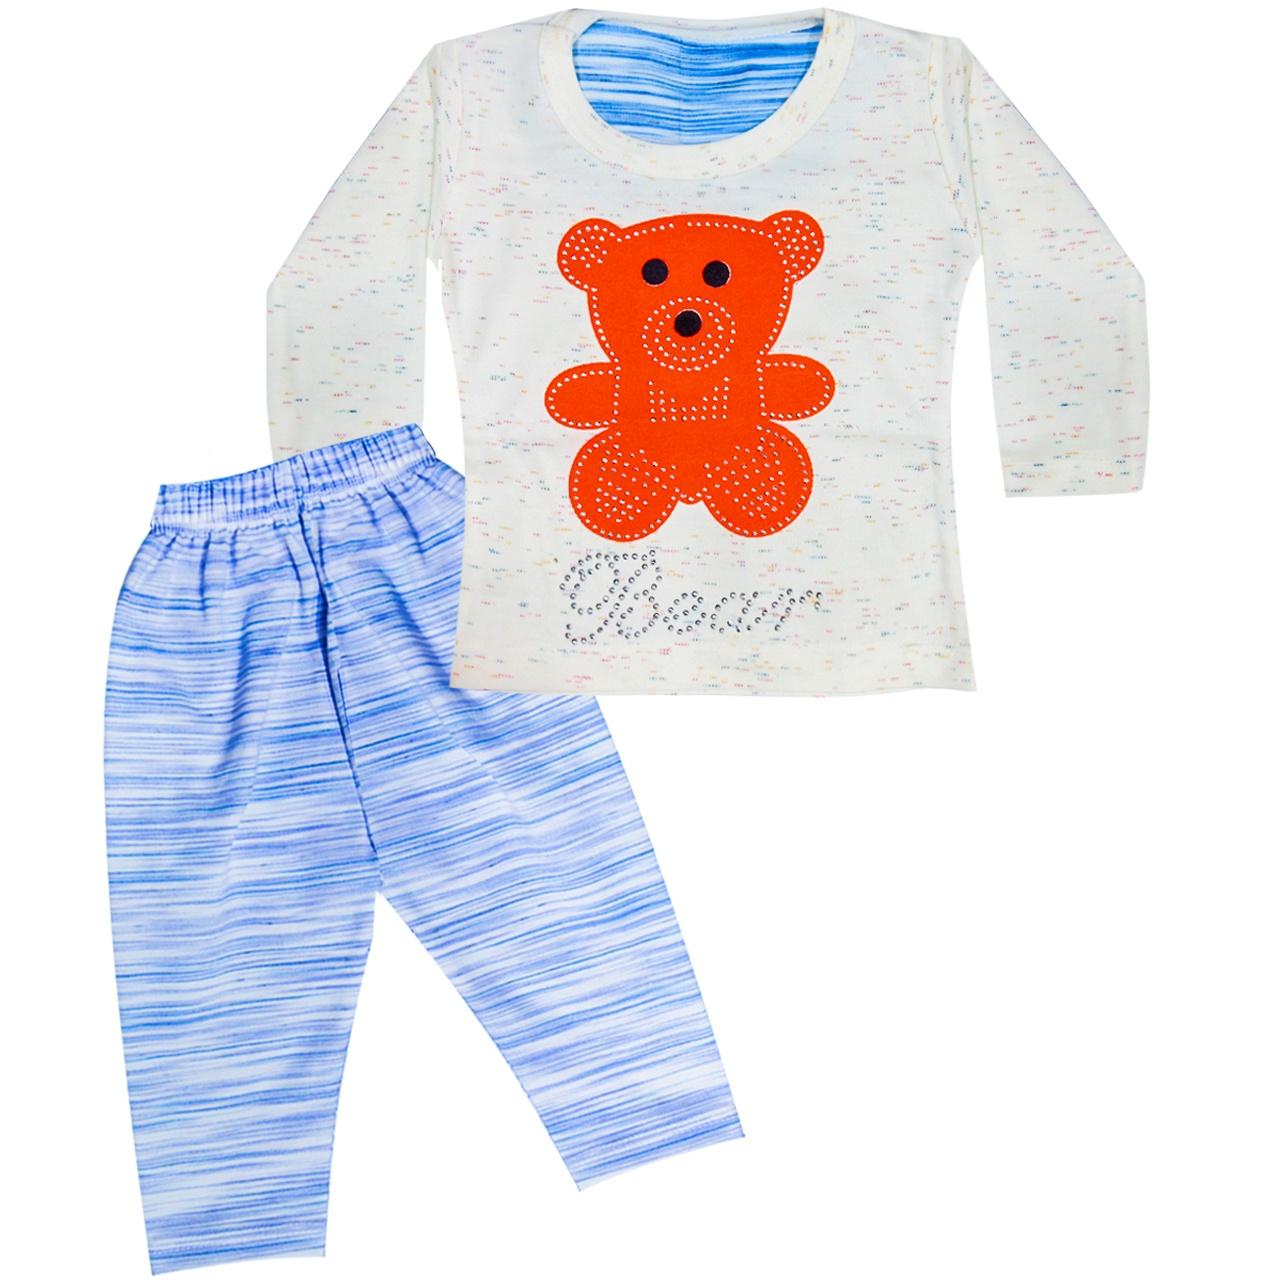 بلوز و شلوار بچگانه طرح Bear رنگ نارنجی